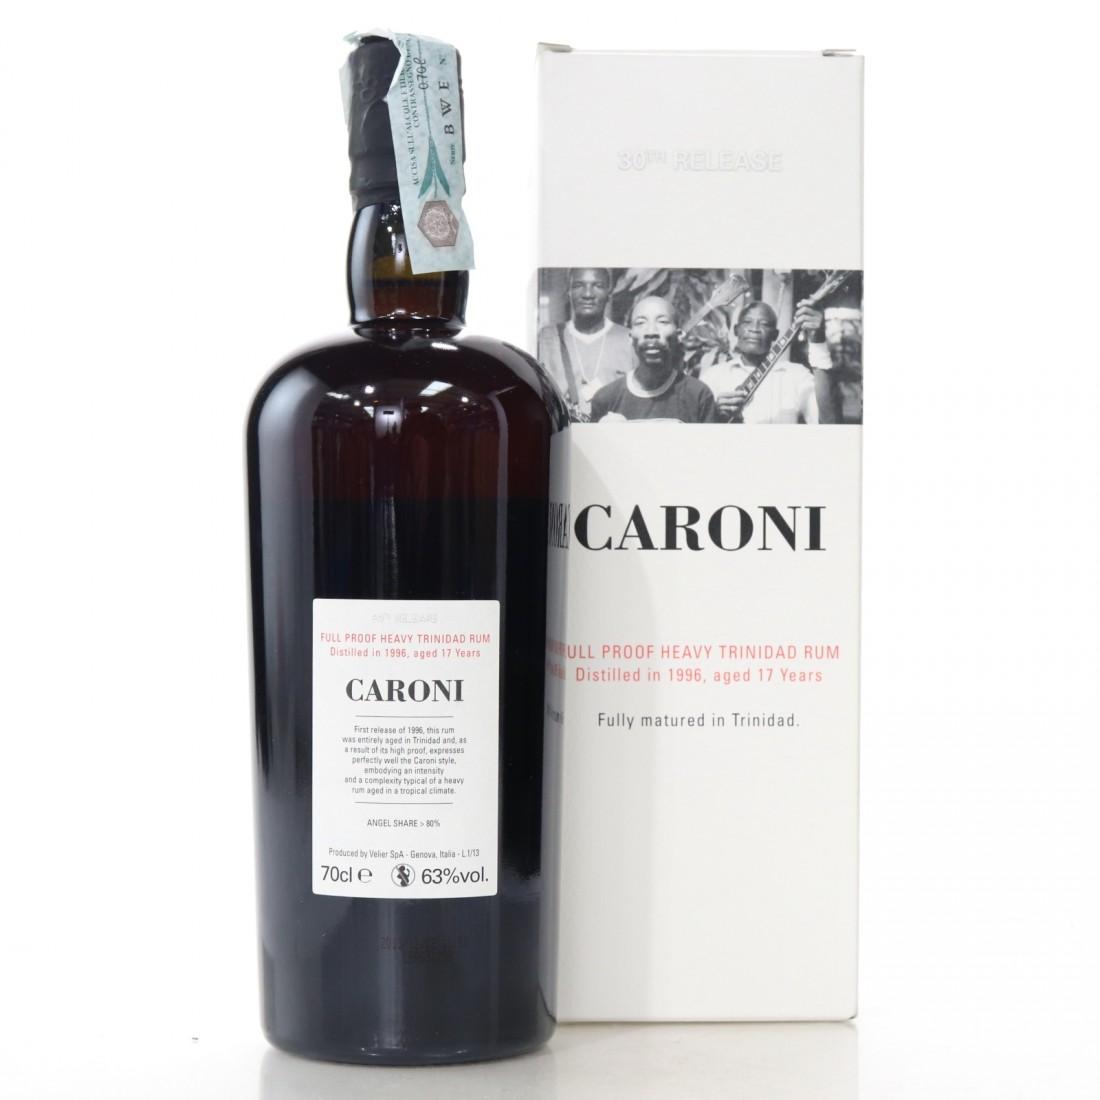 Caroni 1996 Velier 17 Year Old Full Proof Heavy